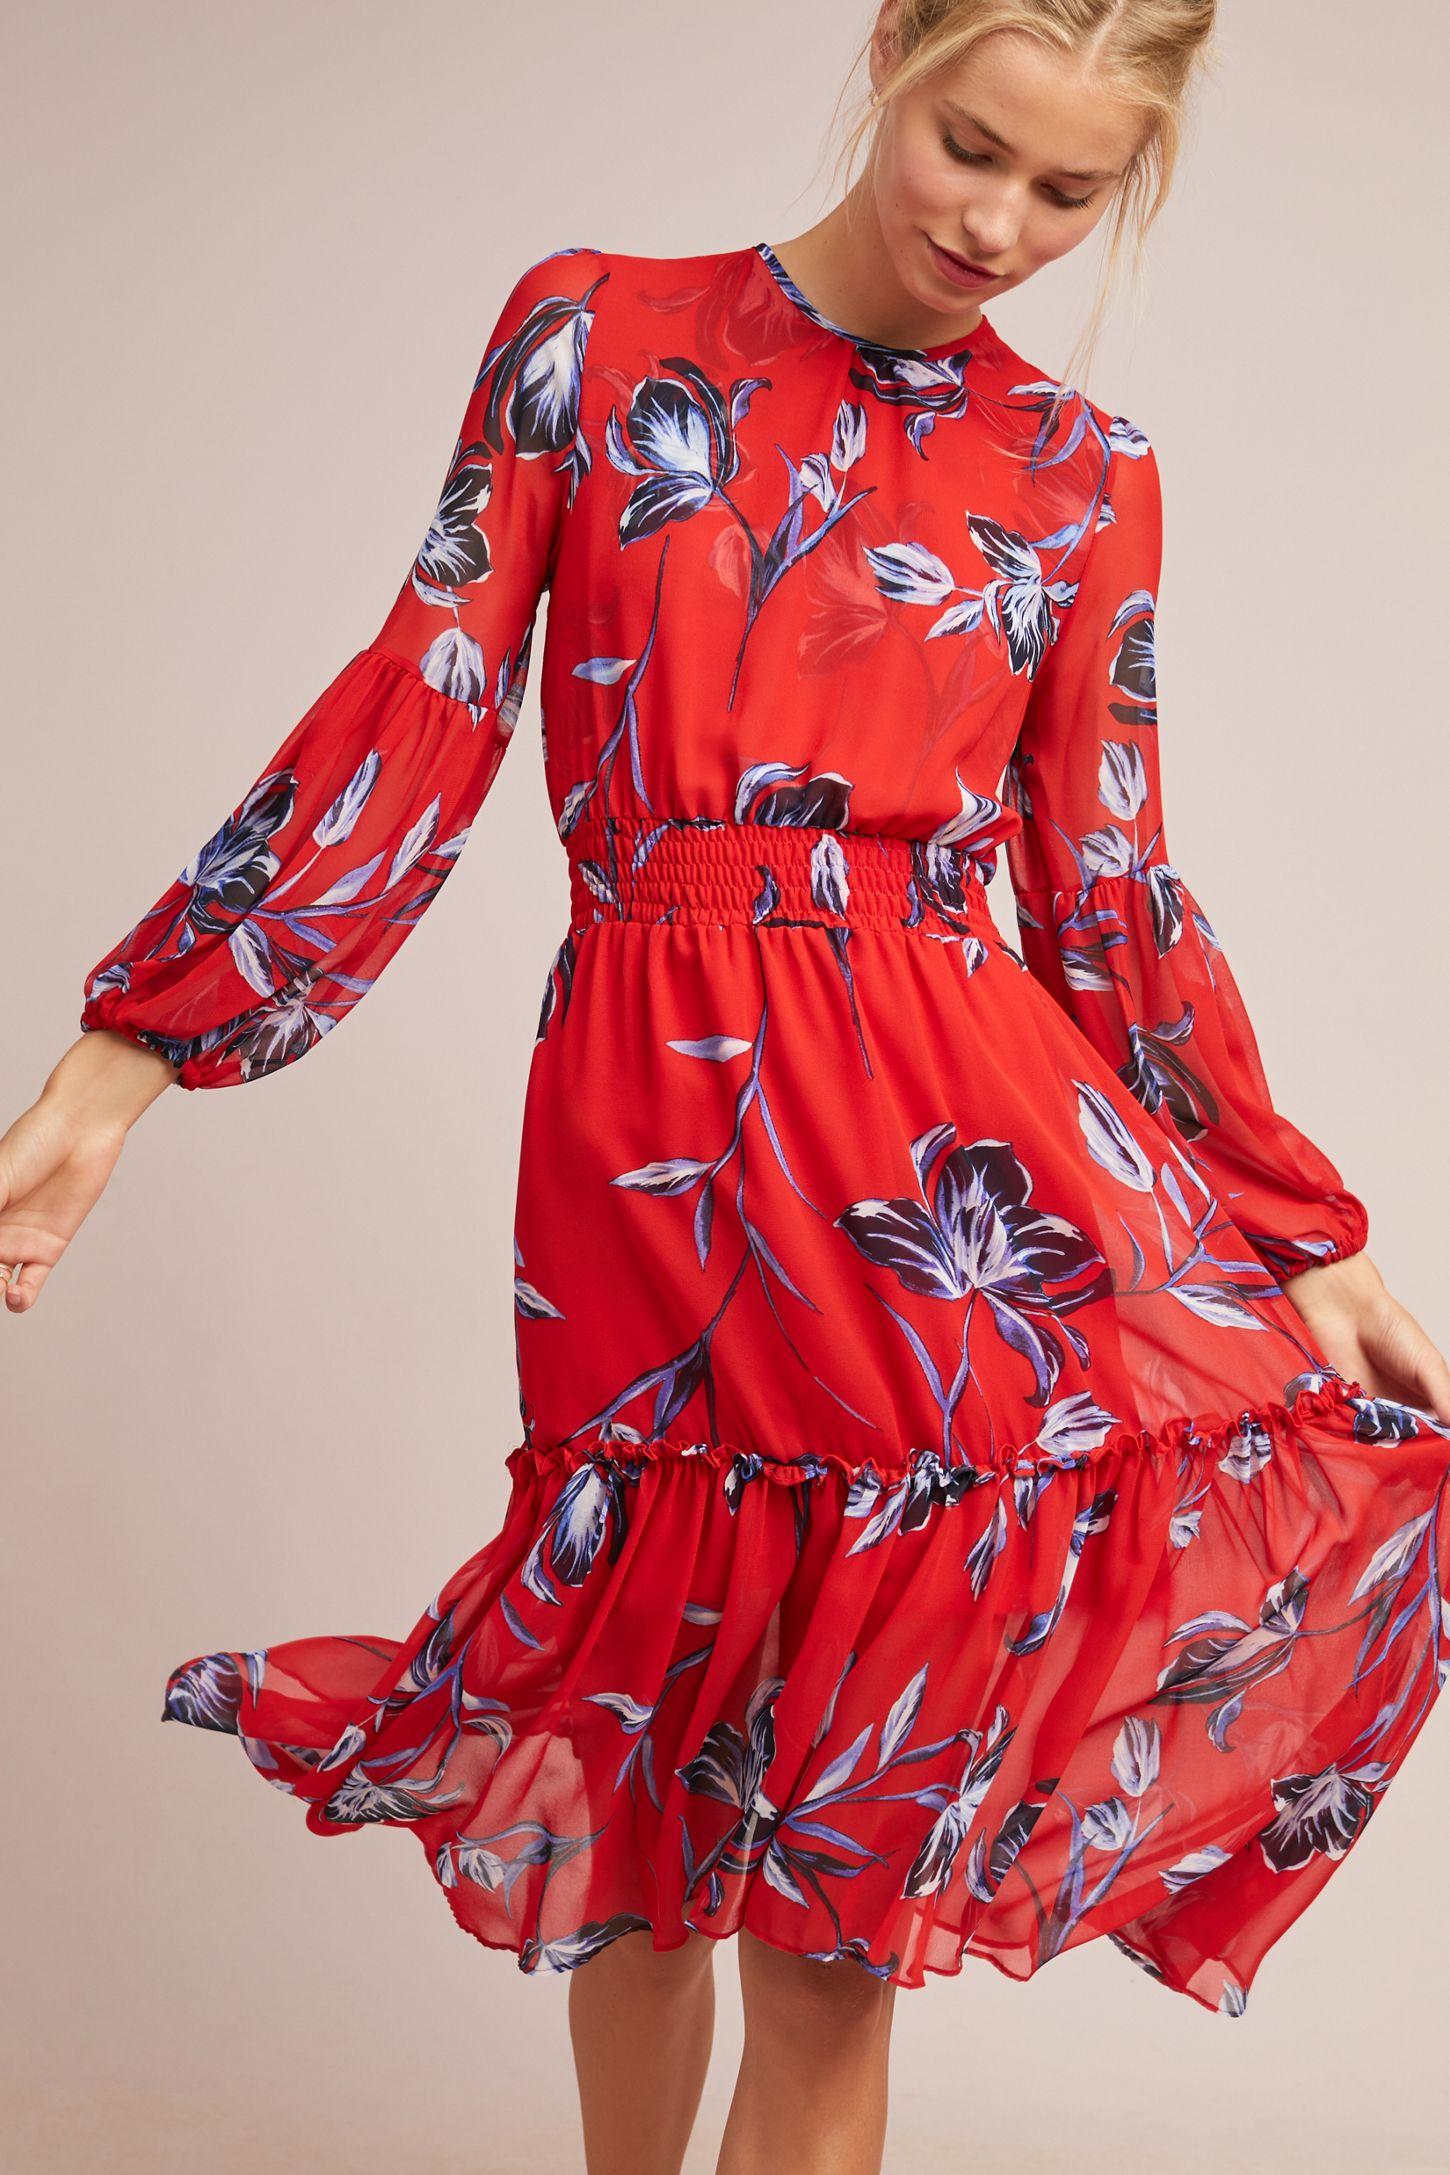 894e566c6f2c Simone Floral Dress | Anthropologie